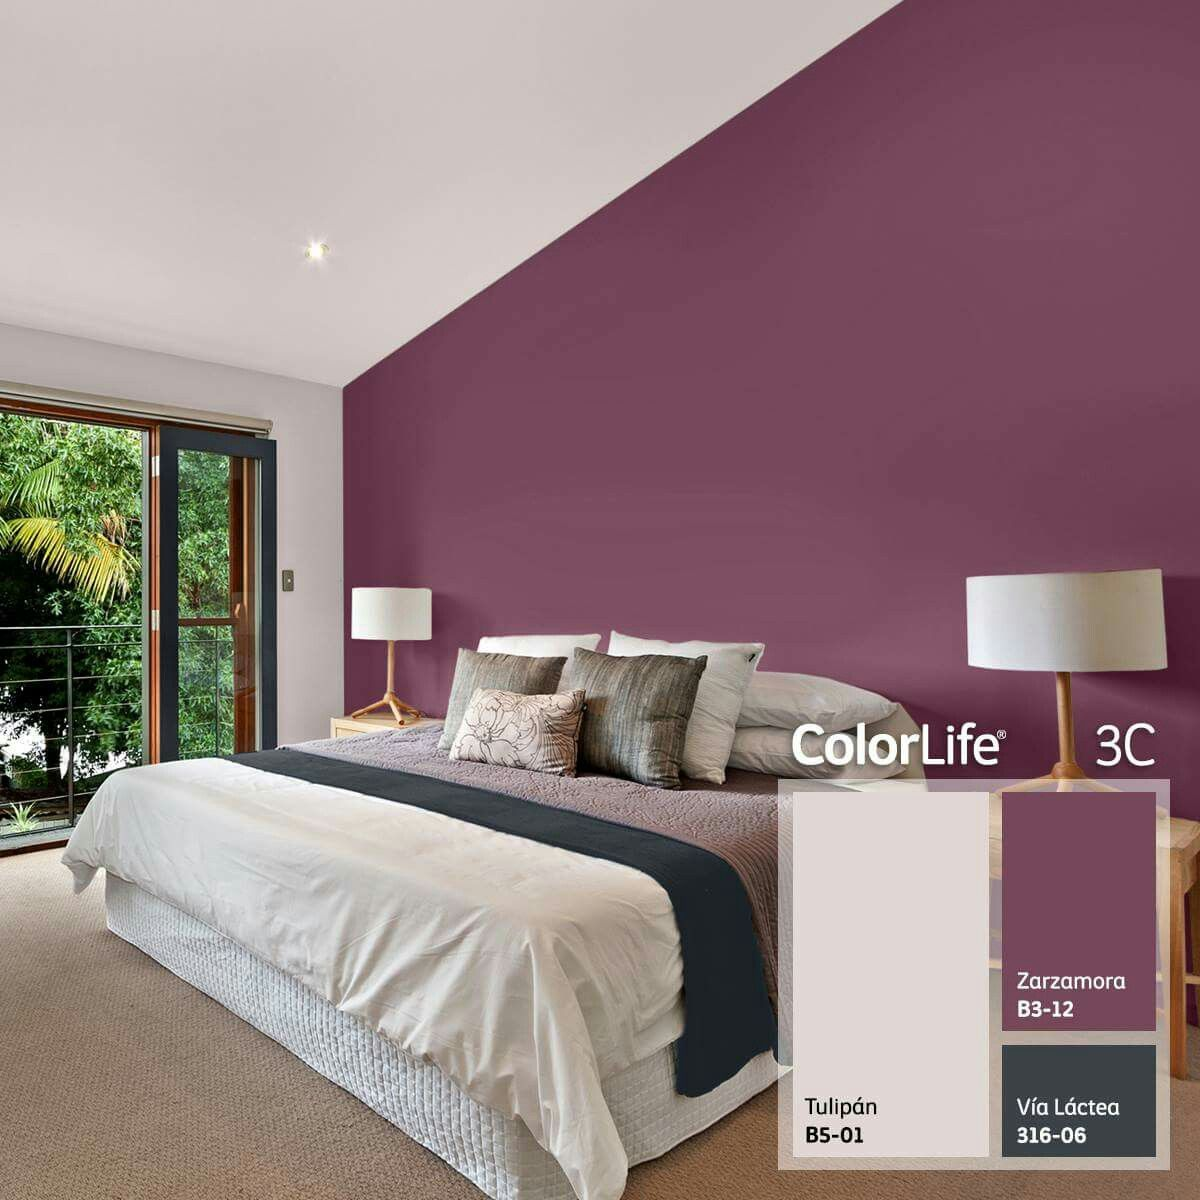 F rmula 3c comex dormitorios pinterest recamara - Decoracion pintura dormitorios ...